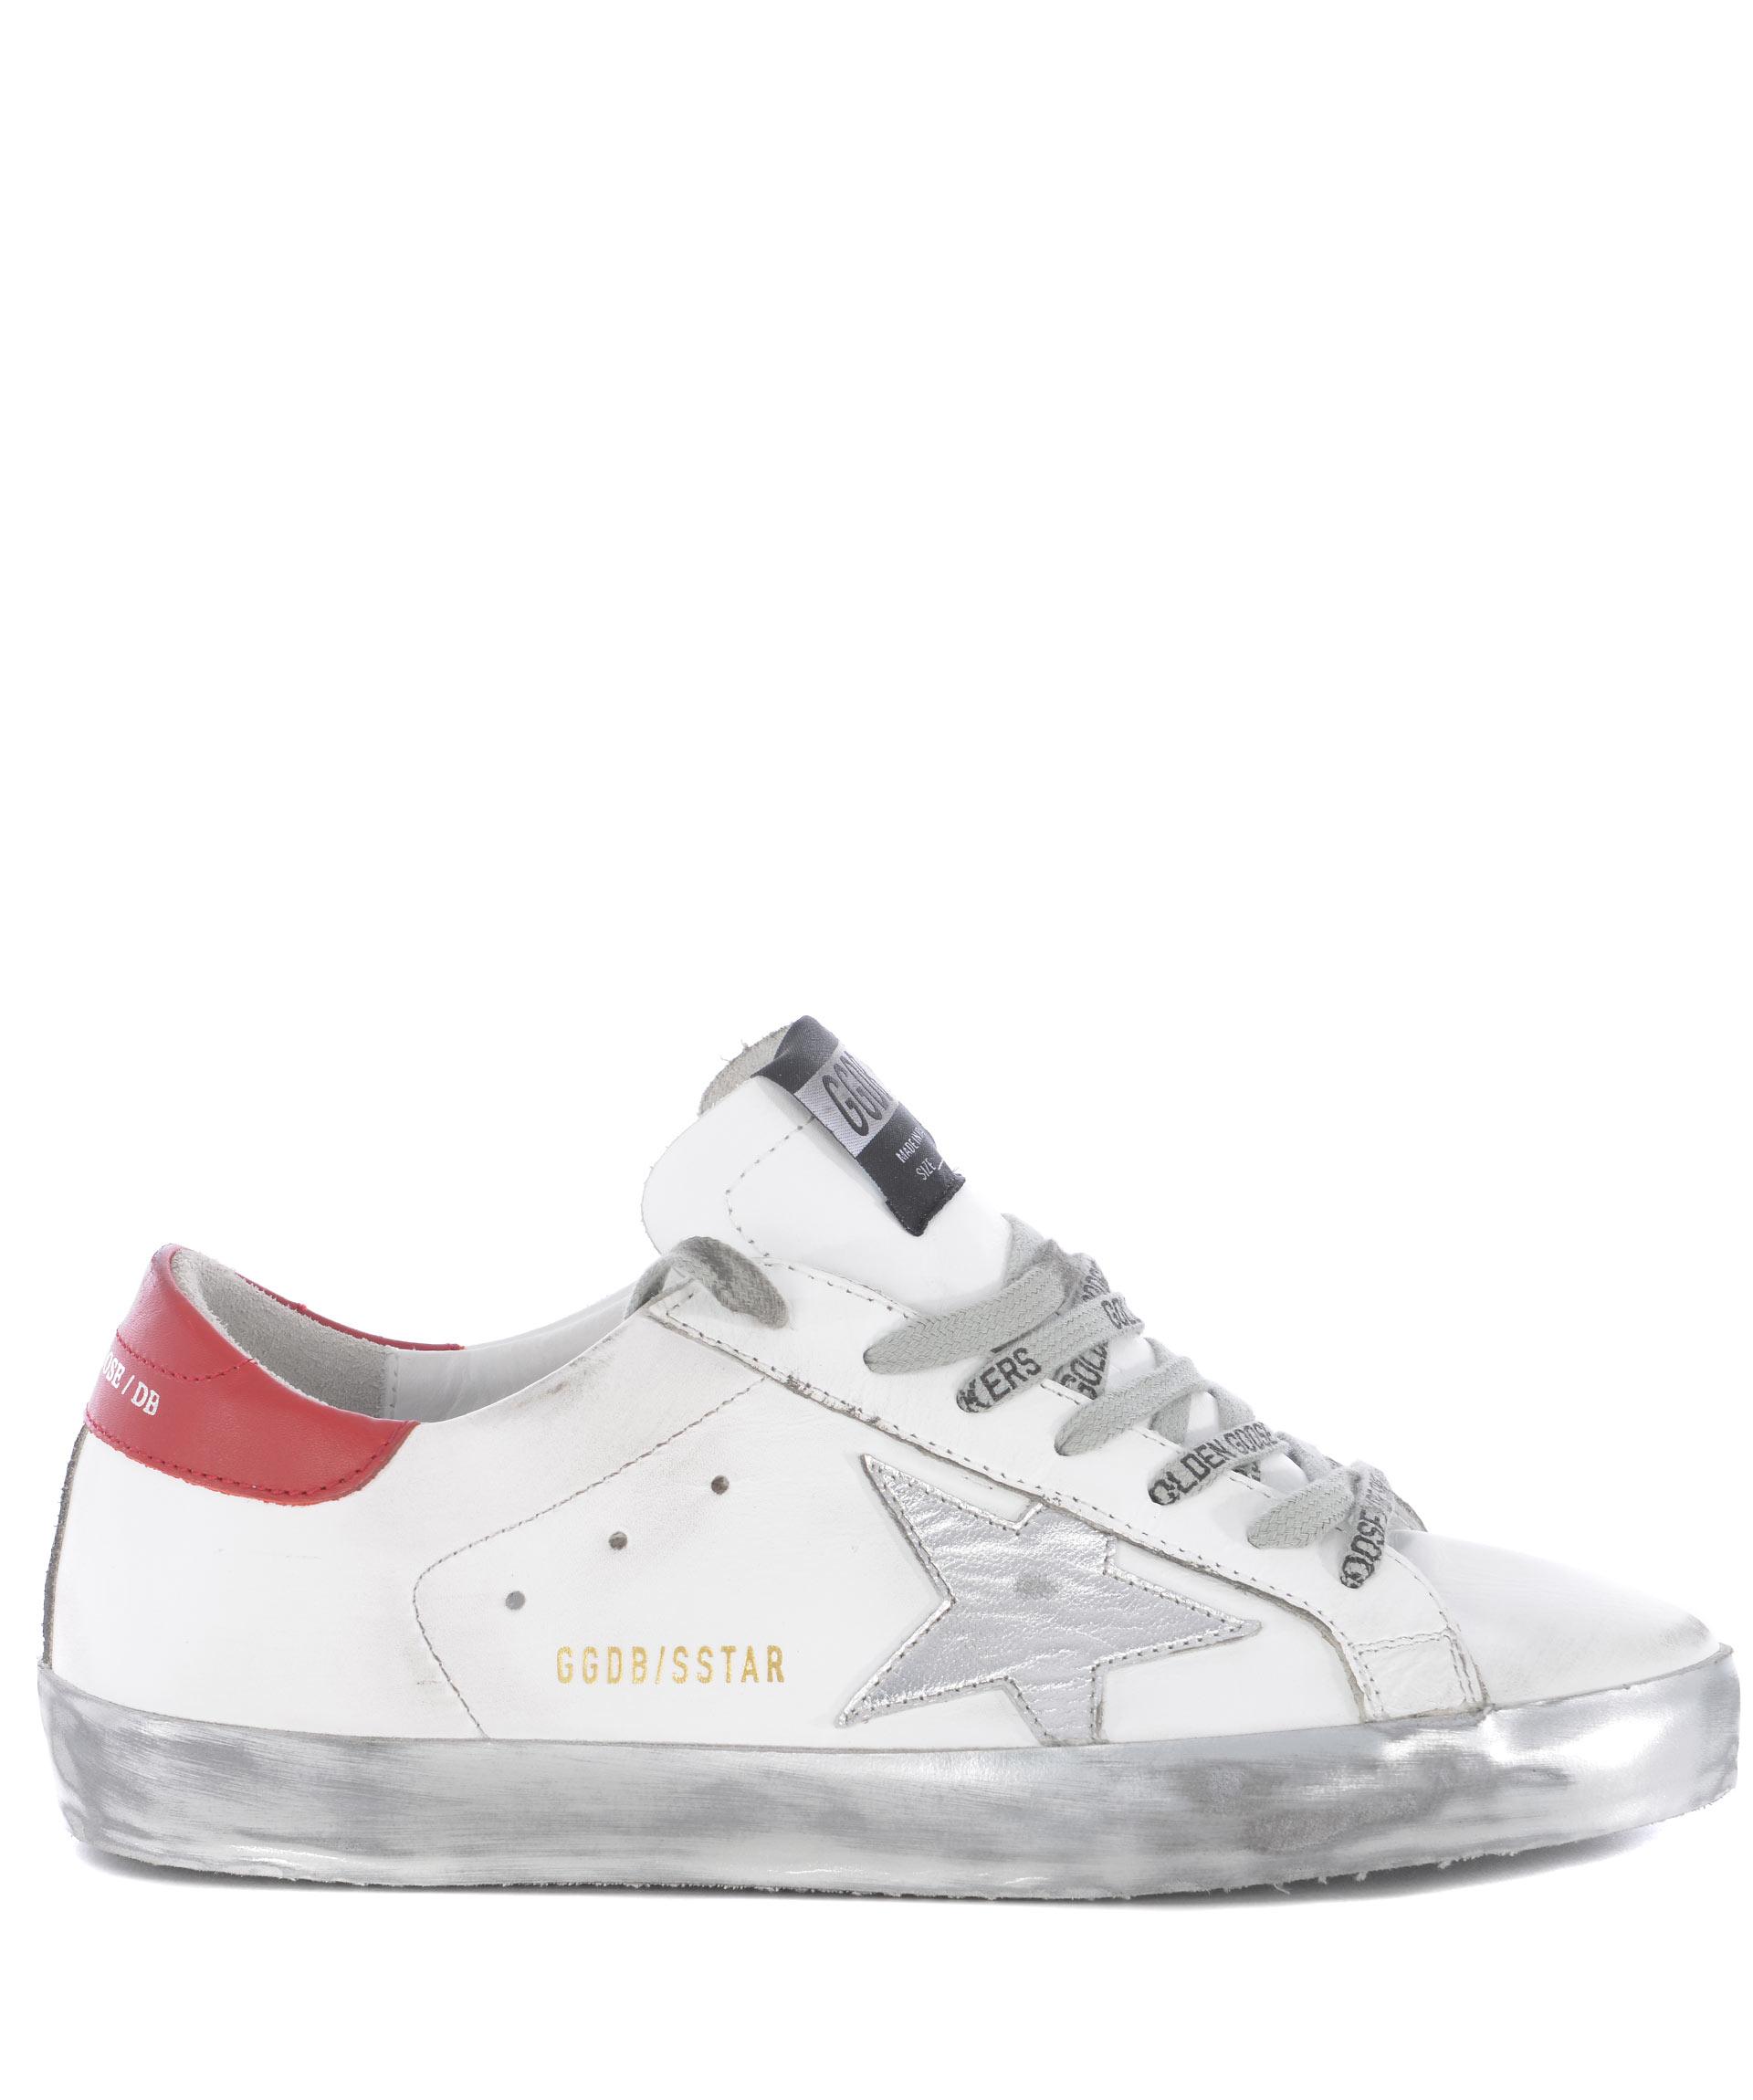 1384588f47 Sneakers uomo Golden Goose